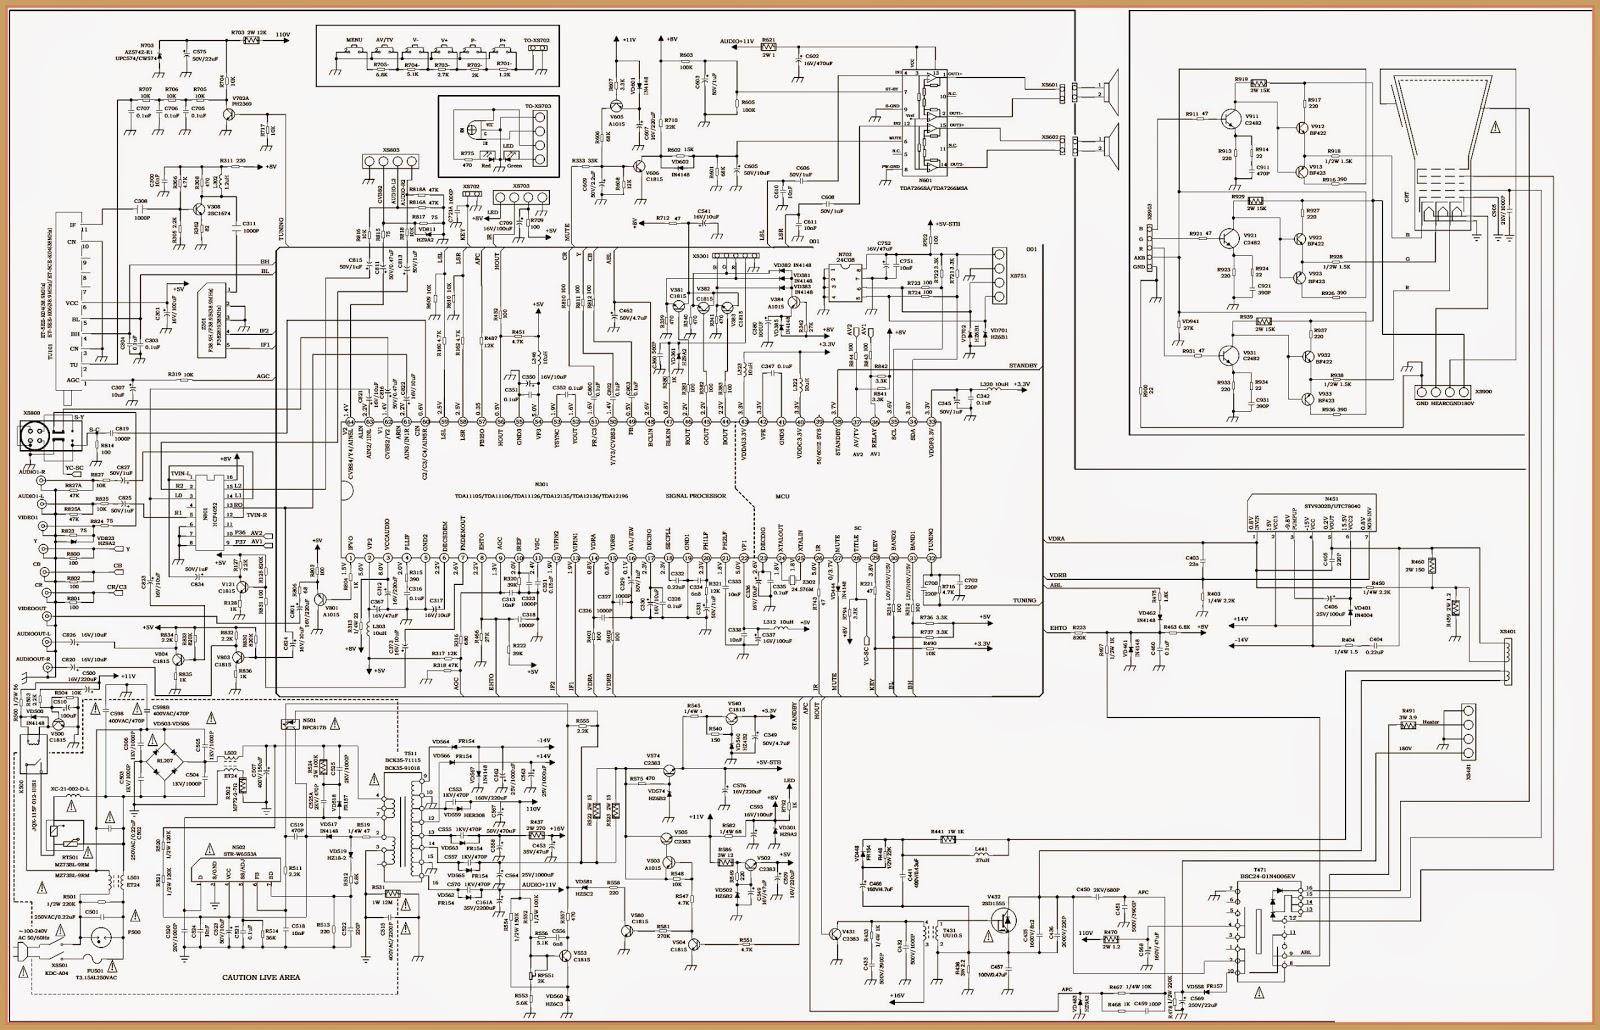 pyle amp wiring diagram pyle free engine image for user manual